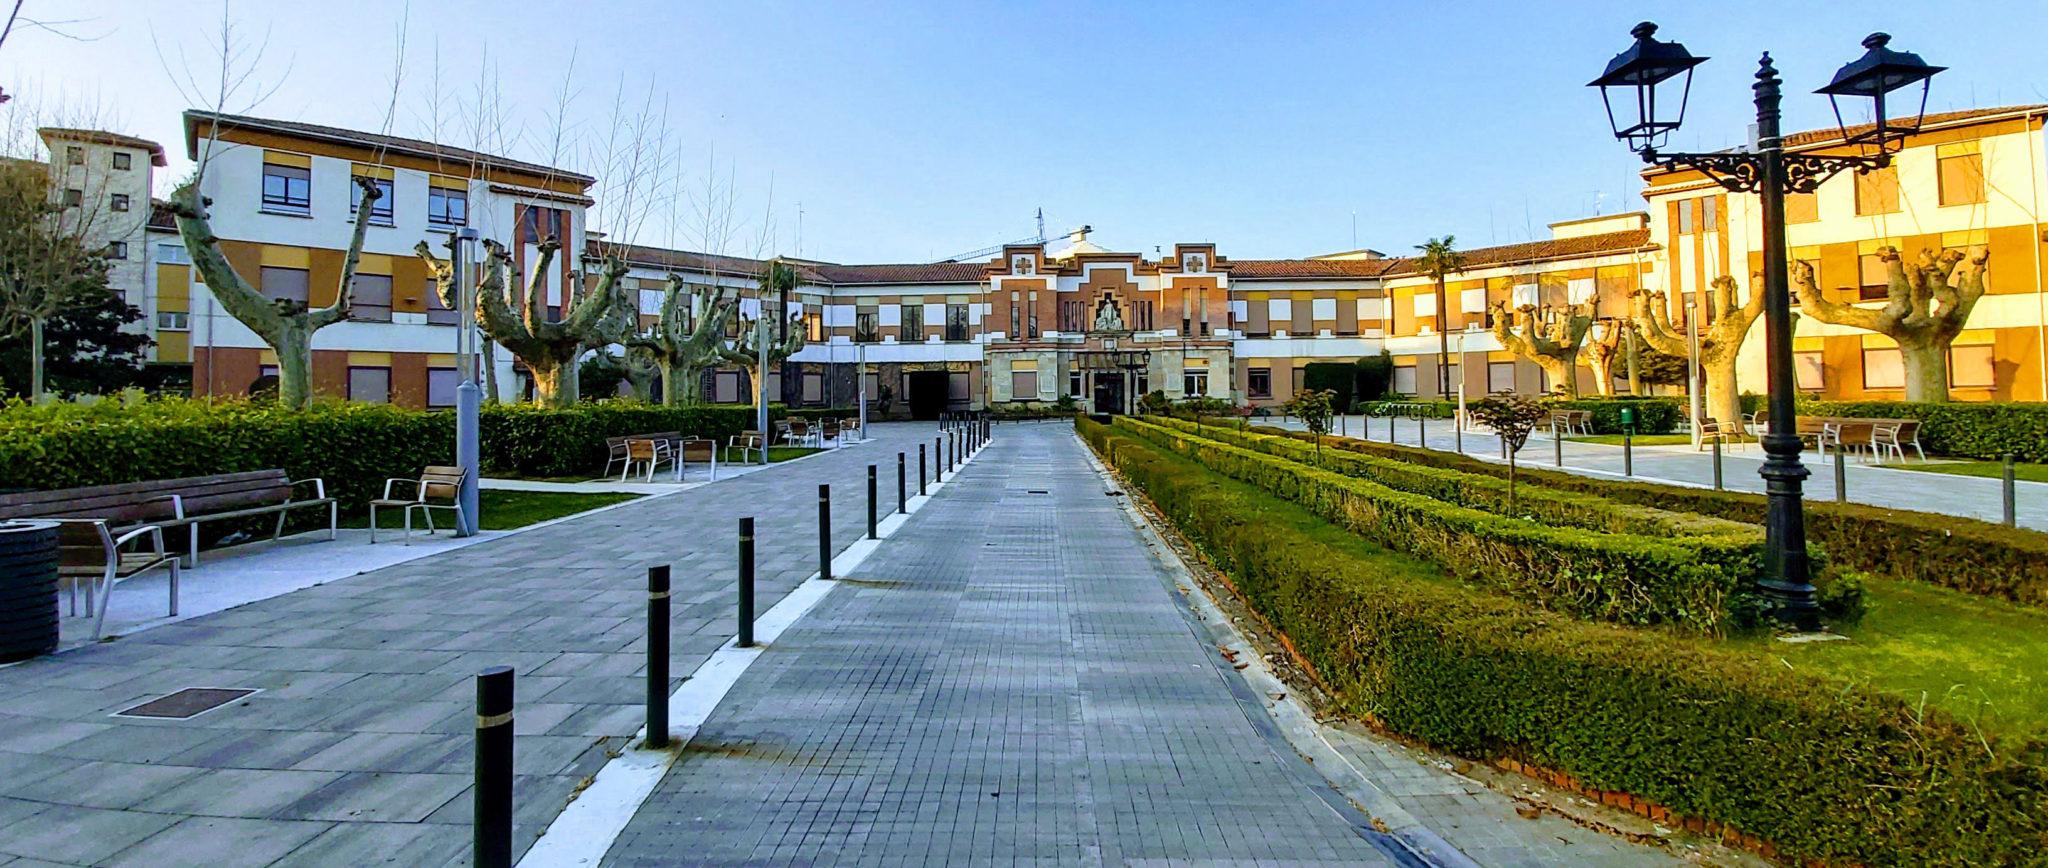 Portada De La Casa De Misericordia De Pamplona